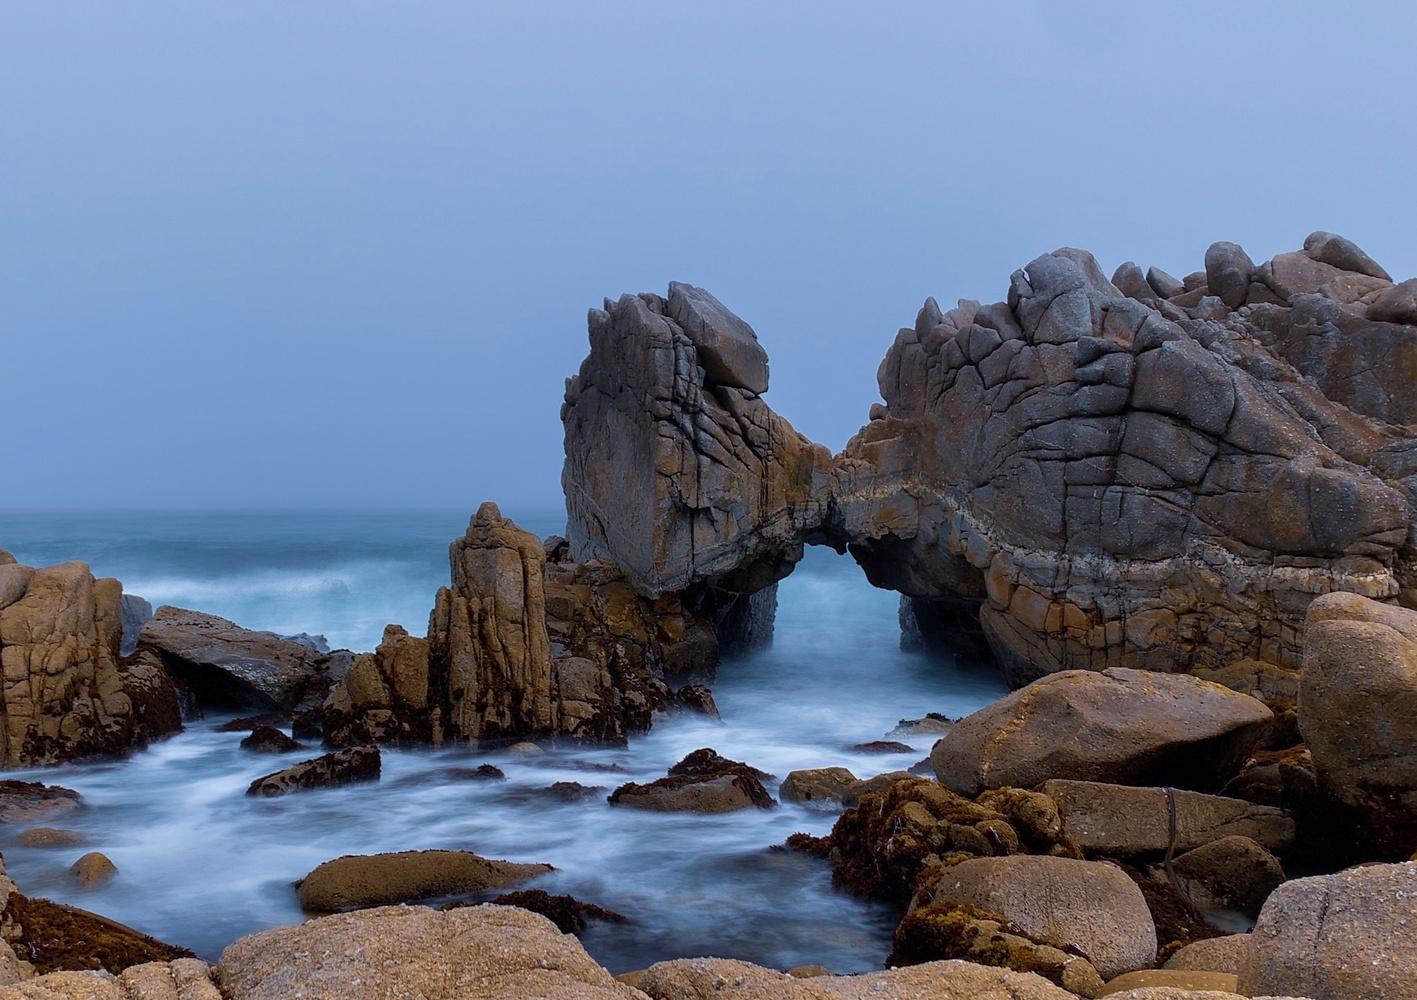 The Kissing Rock - Monterey, CA by Jonathan Monroe